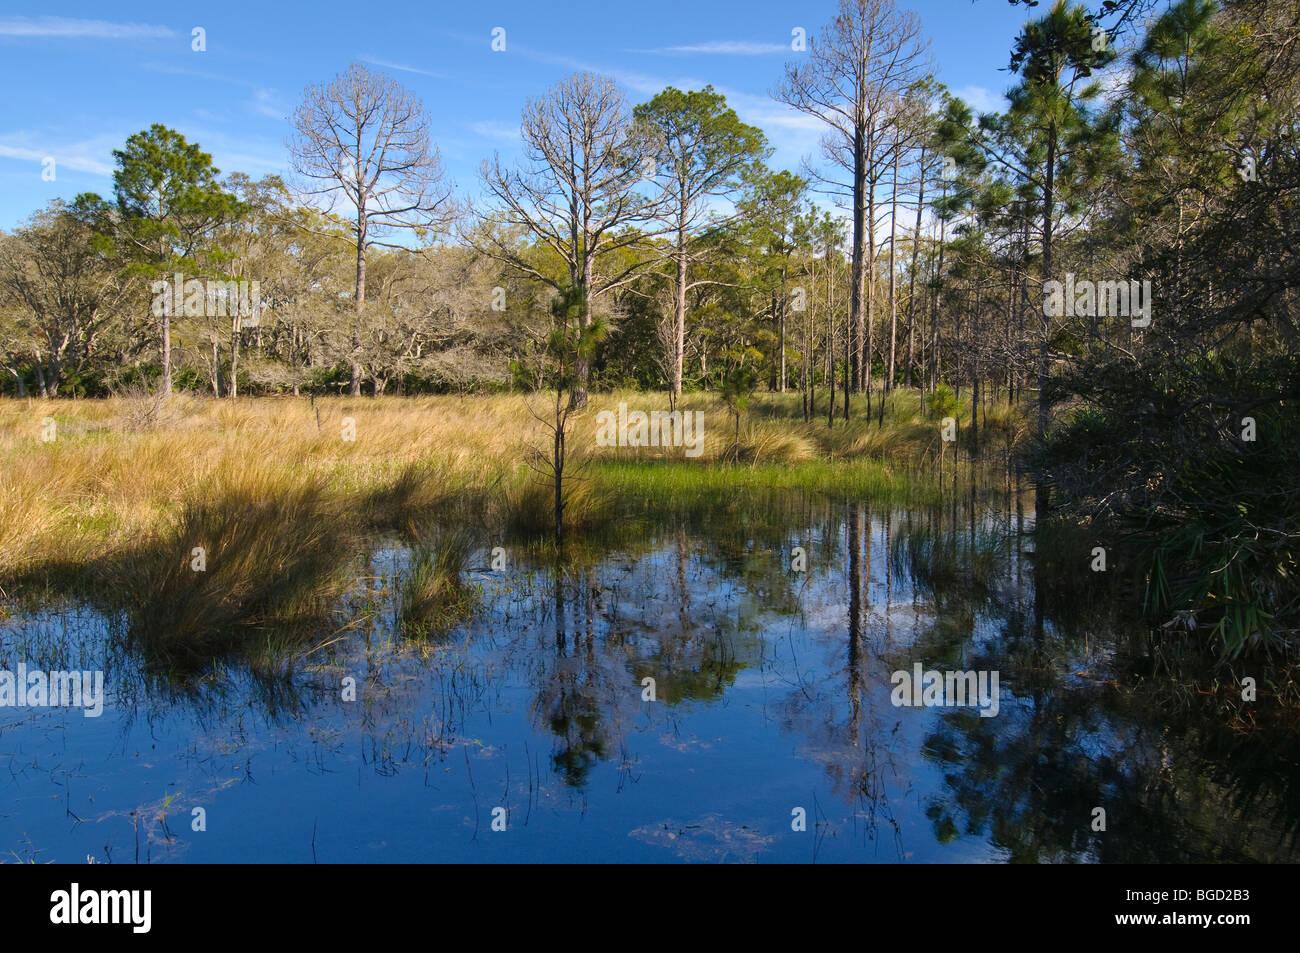 Guana Tolomato Matanzas National Estuarine Research Reserve St. Johns County Florida, USA. - Stock Image